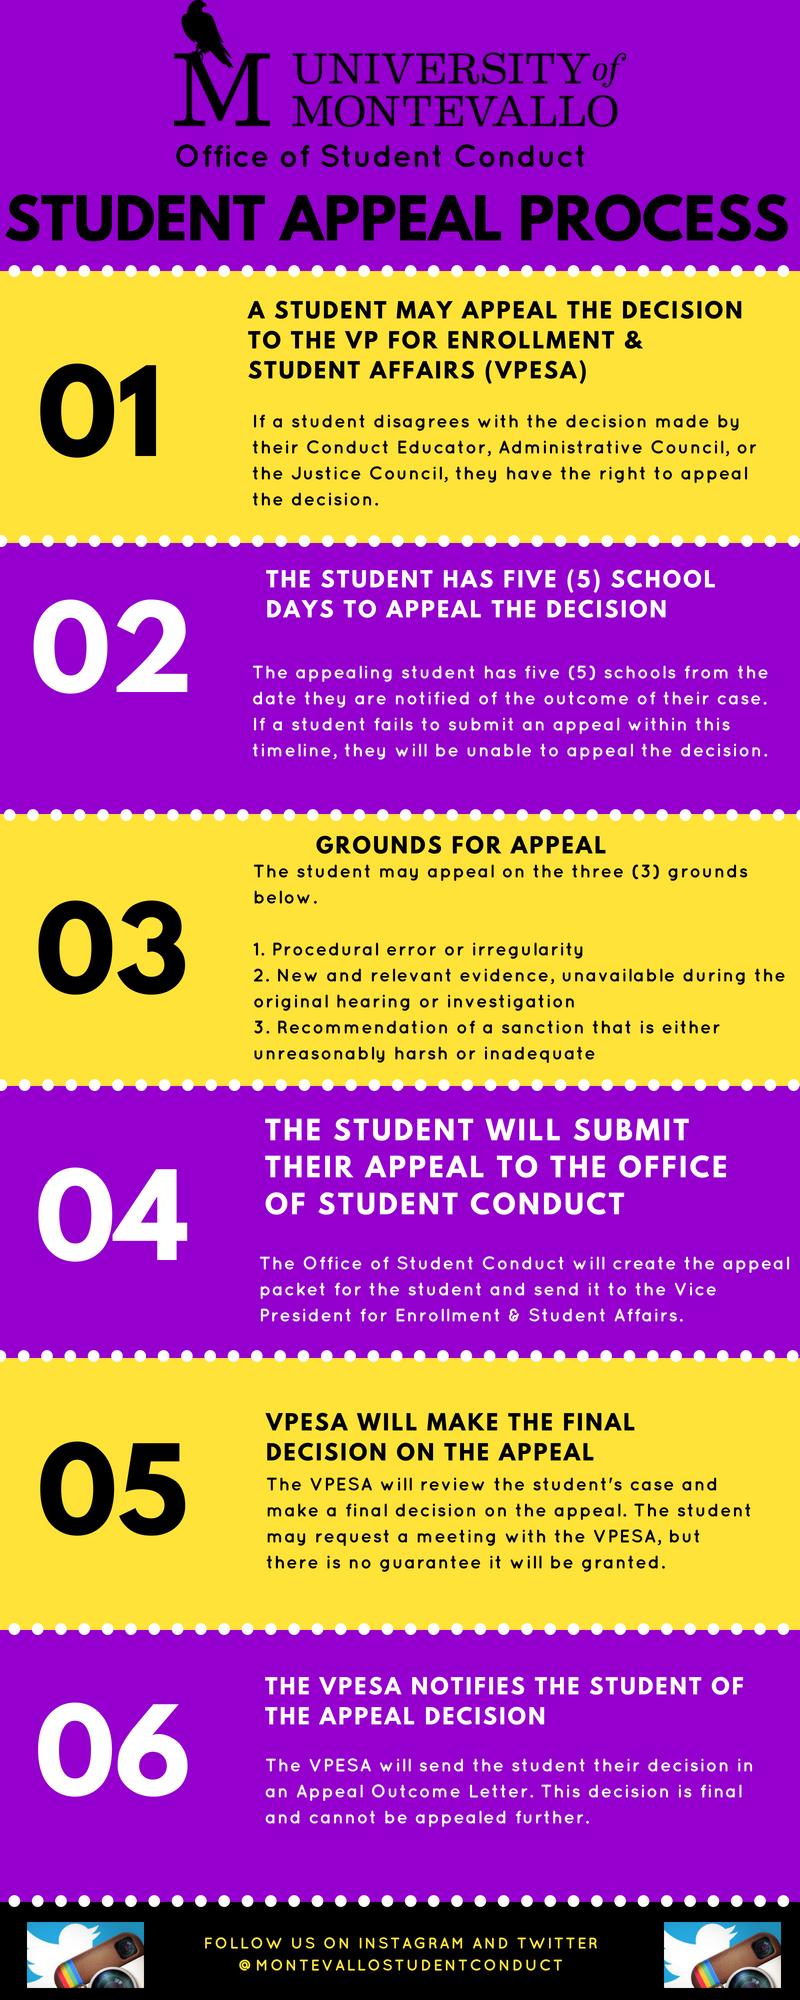 UM Student Appeal Process